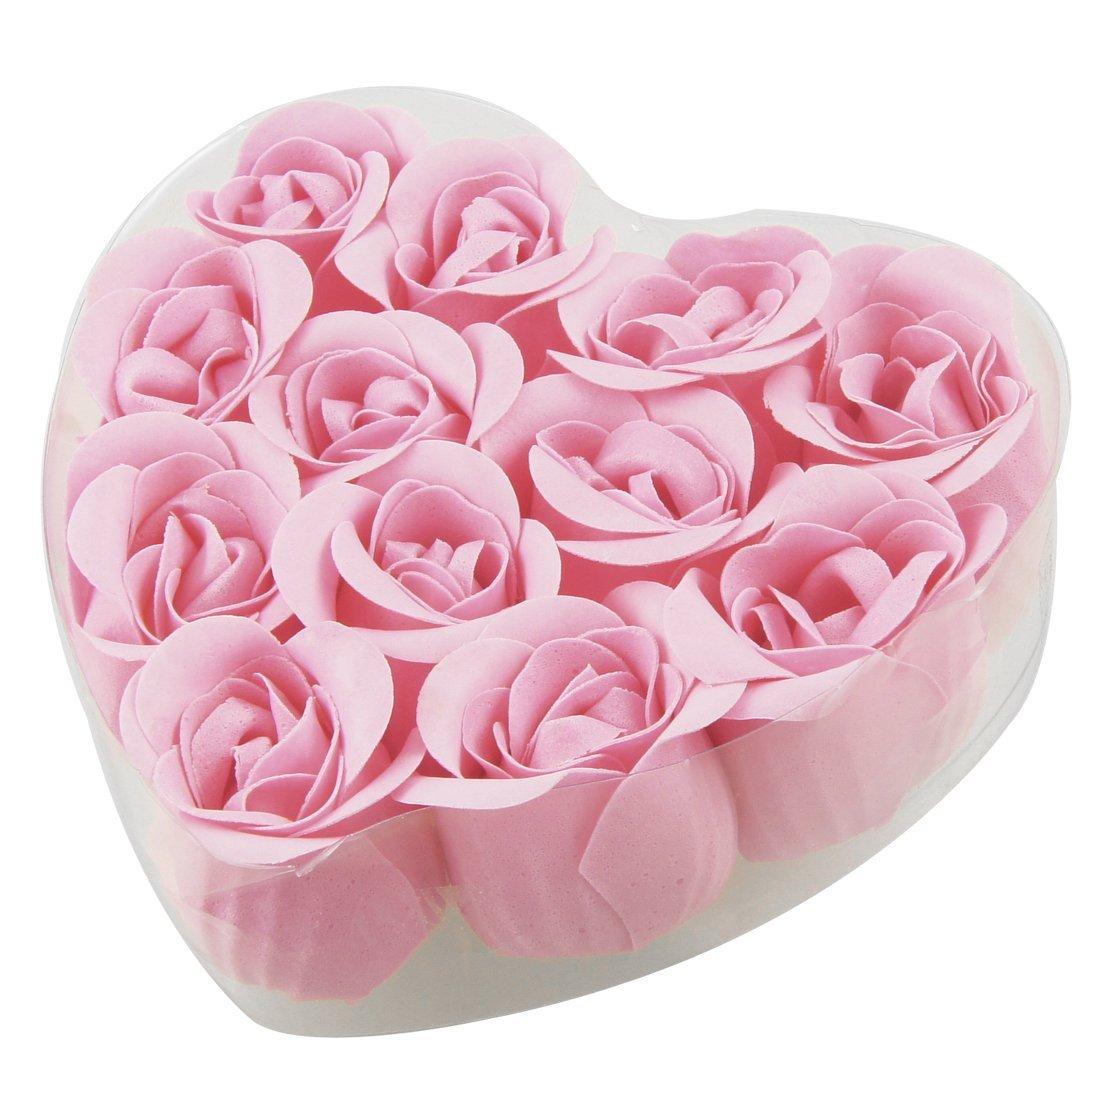 Rose day -Gifts-V11